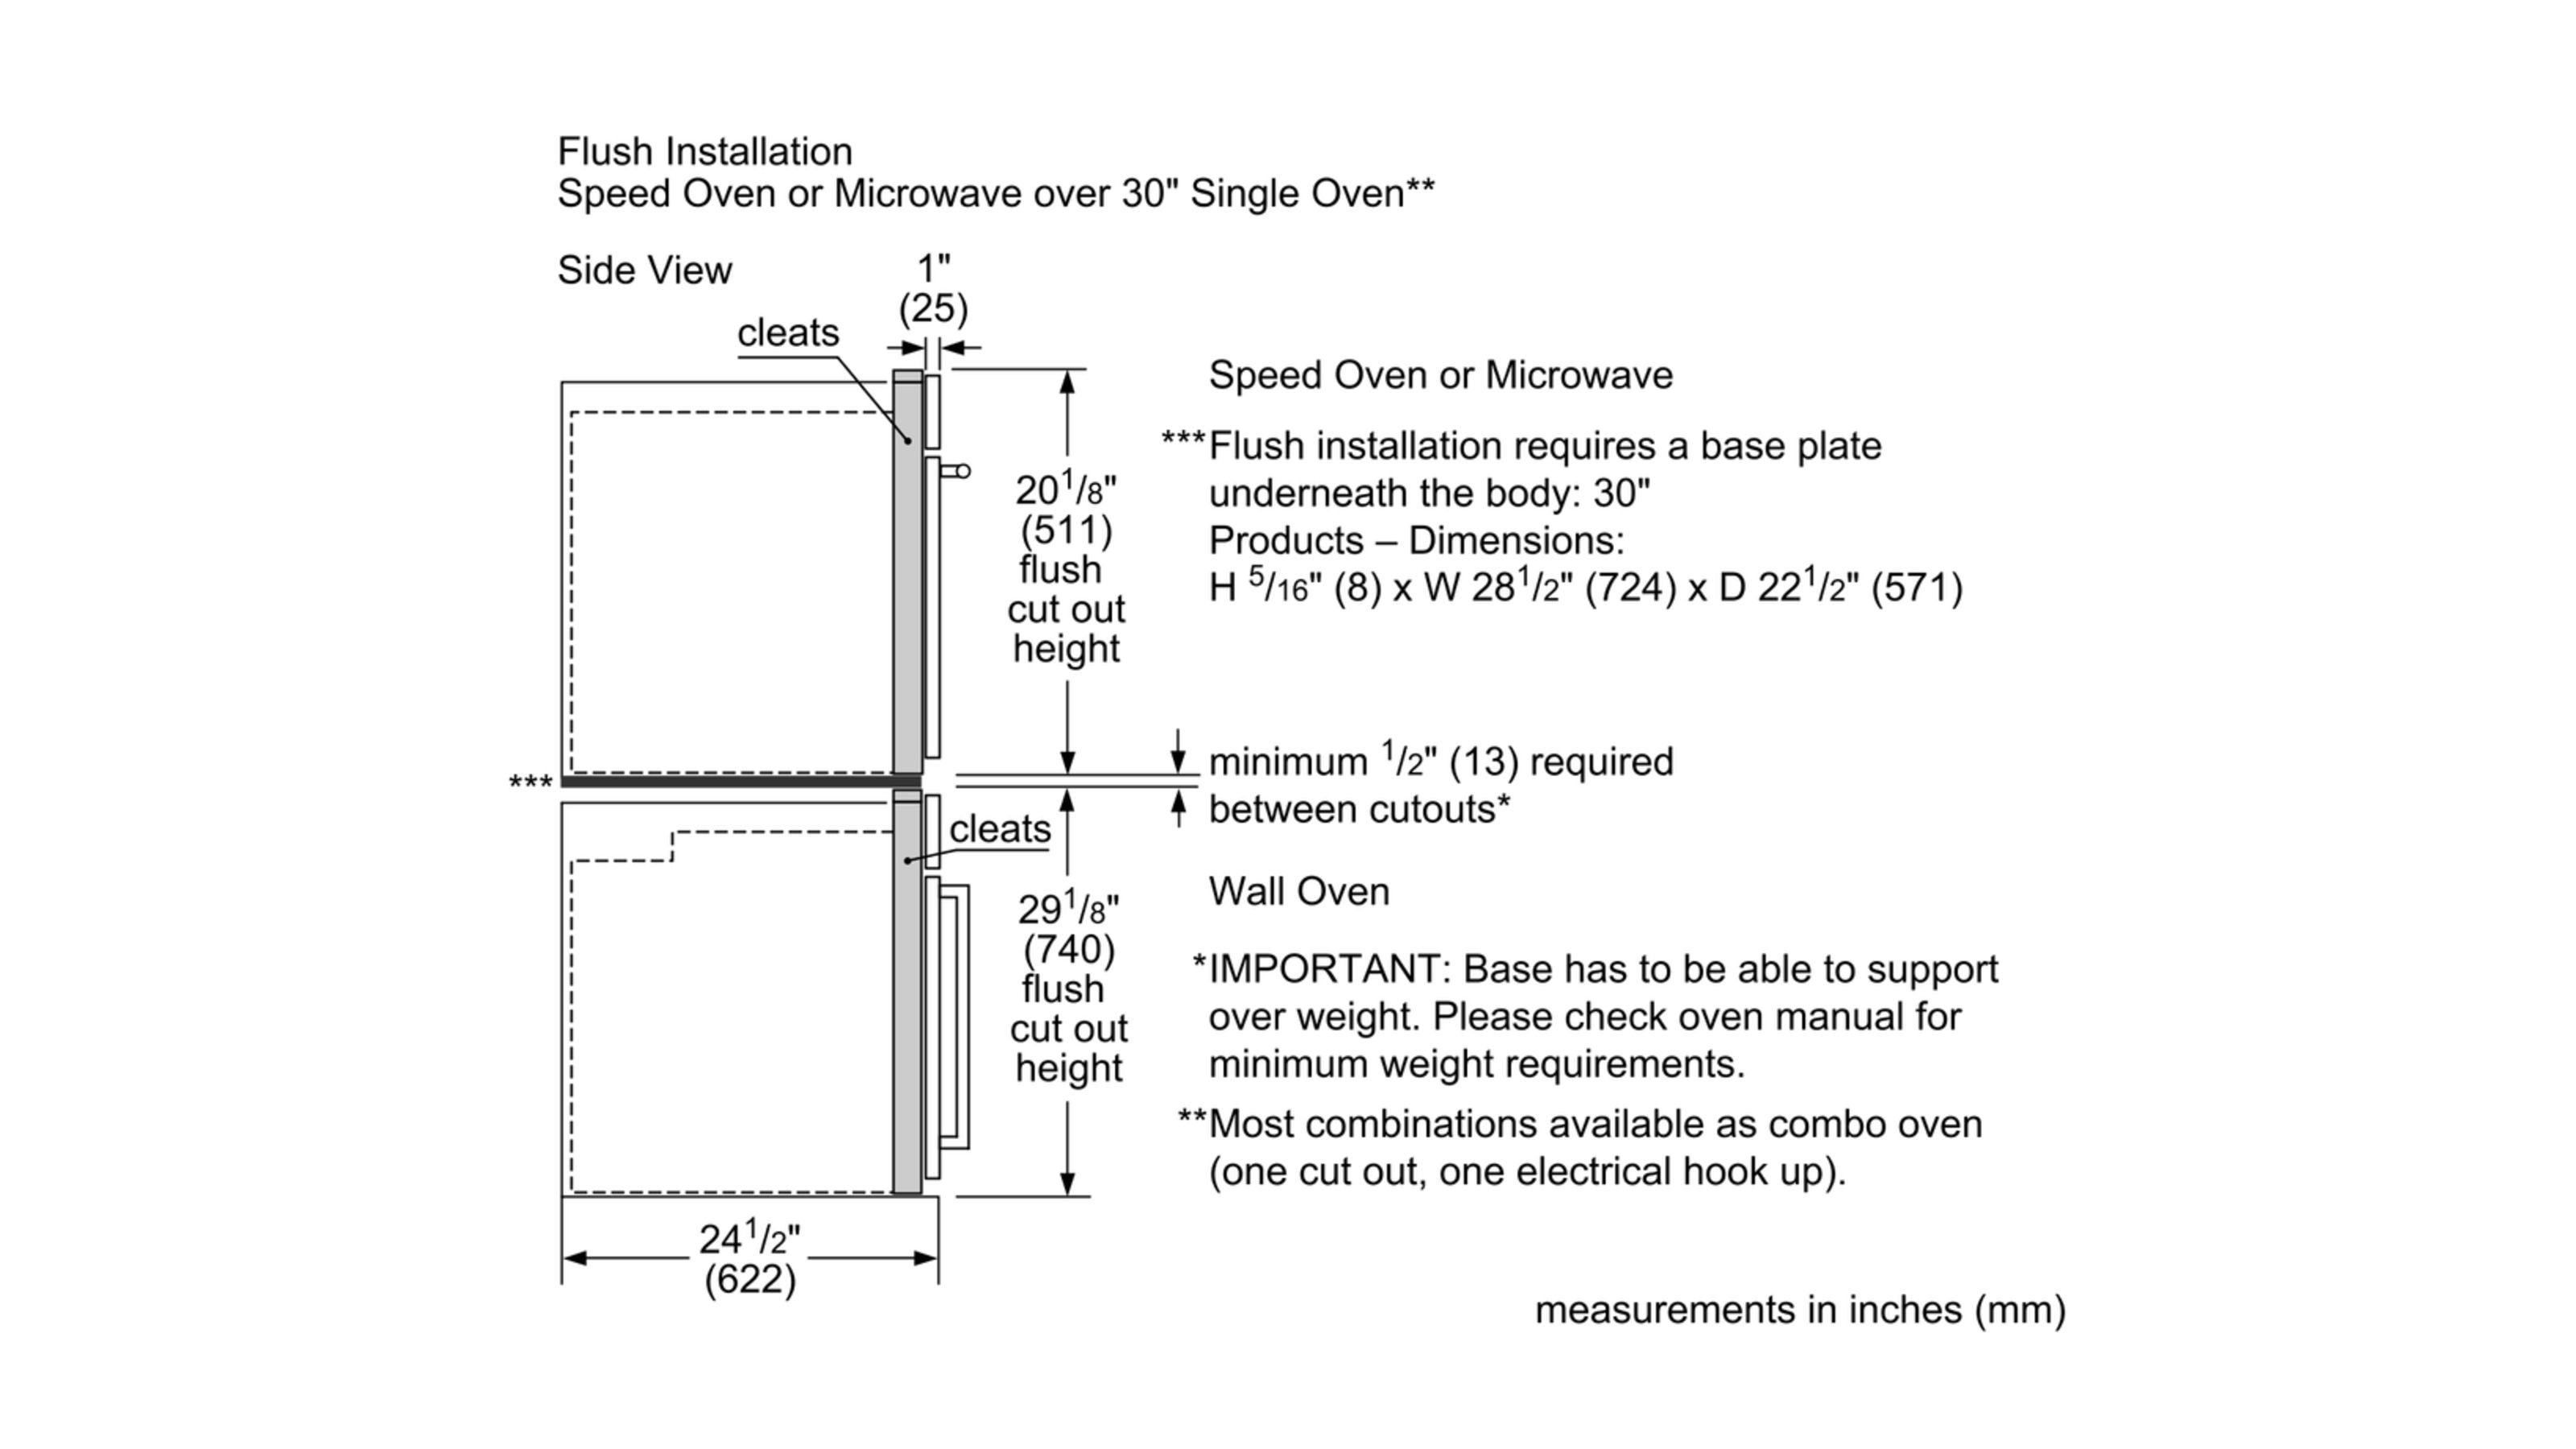 "Model: HMC80252UC | Bosch 800 Series30"" Speed Oven, HMC80252UC, Stainless Steel"